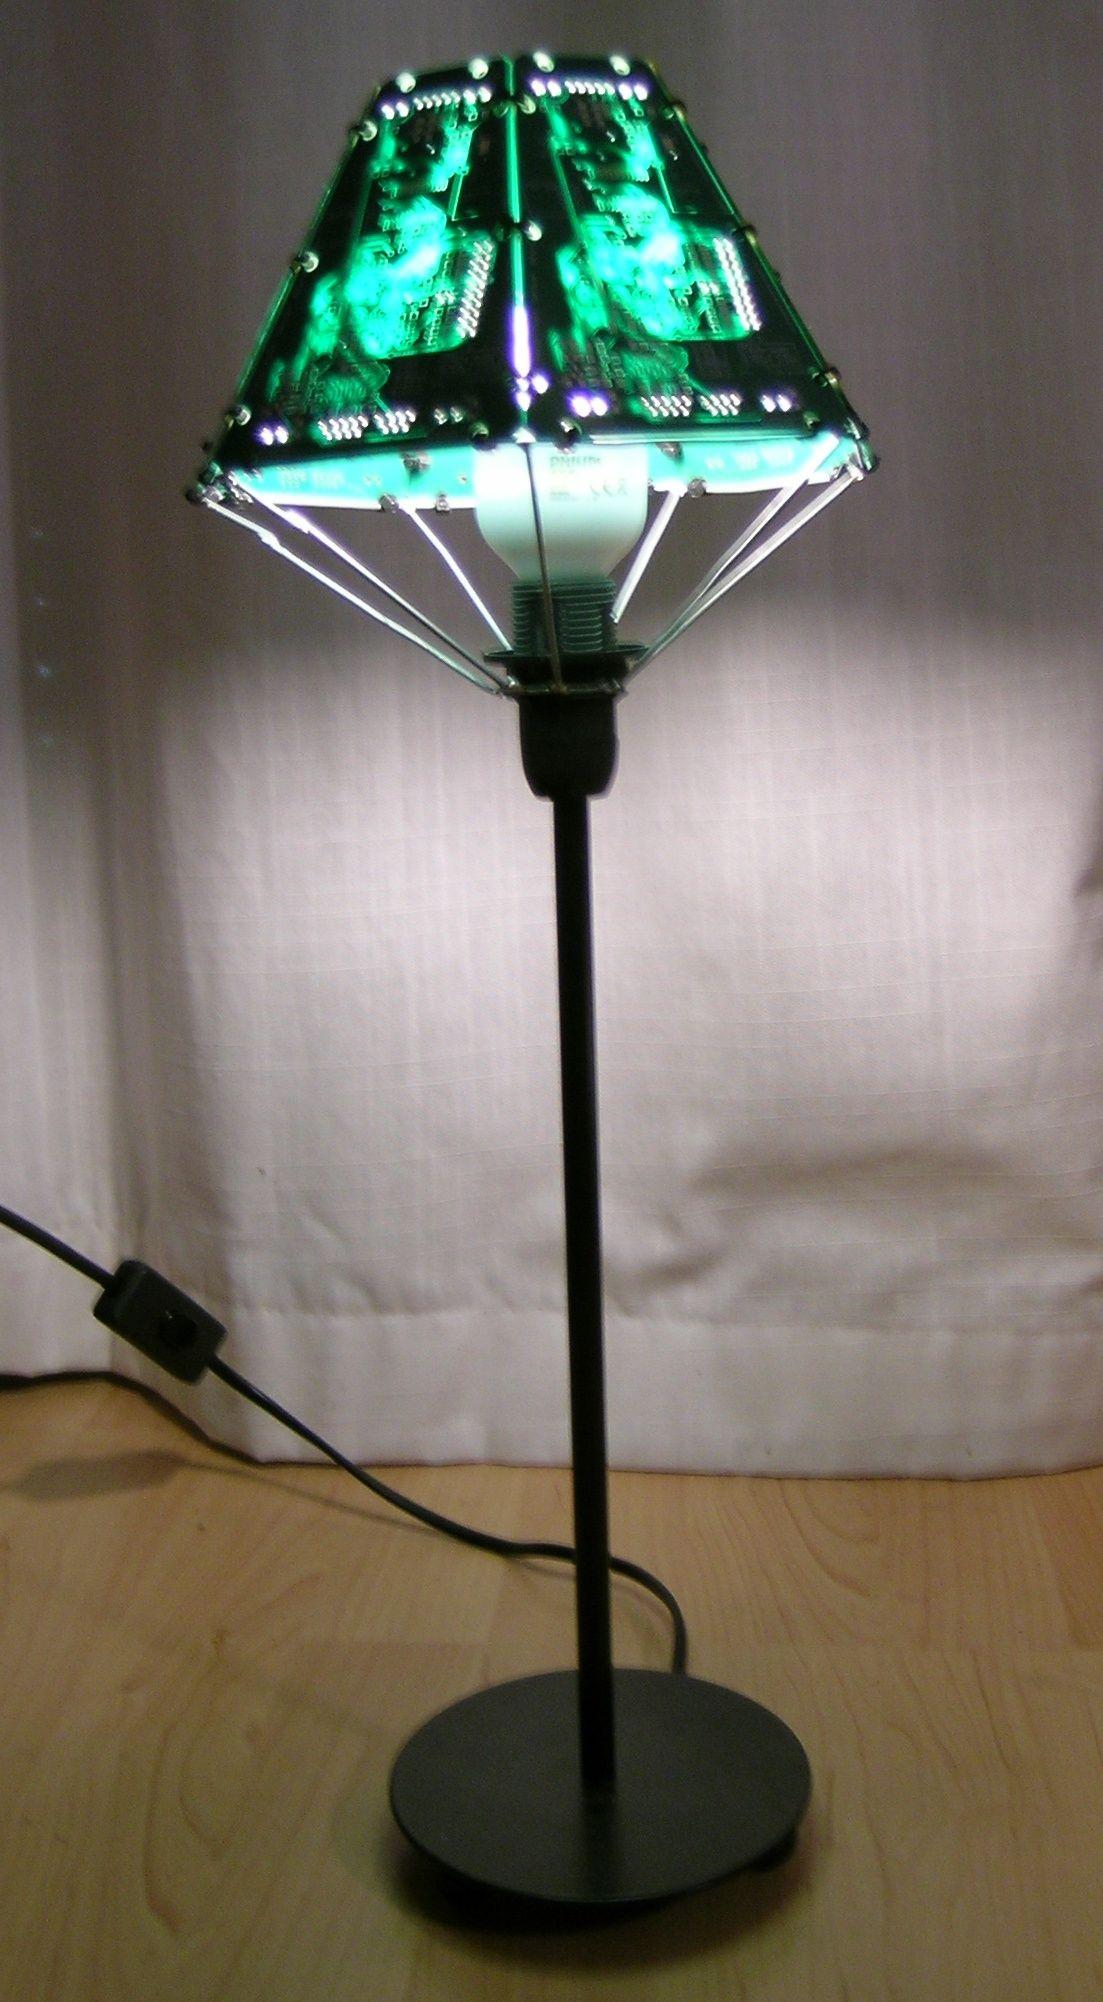 japan lamp upcycled circuit board lamp upcycled lighting pintere rh eu9ulb58 martins world travel info